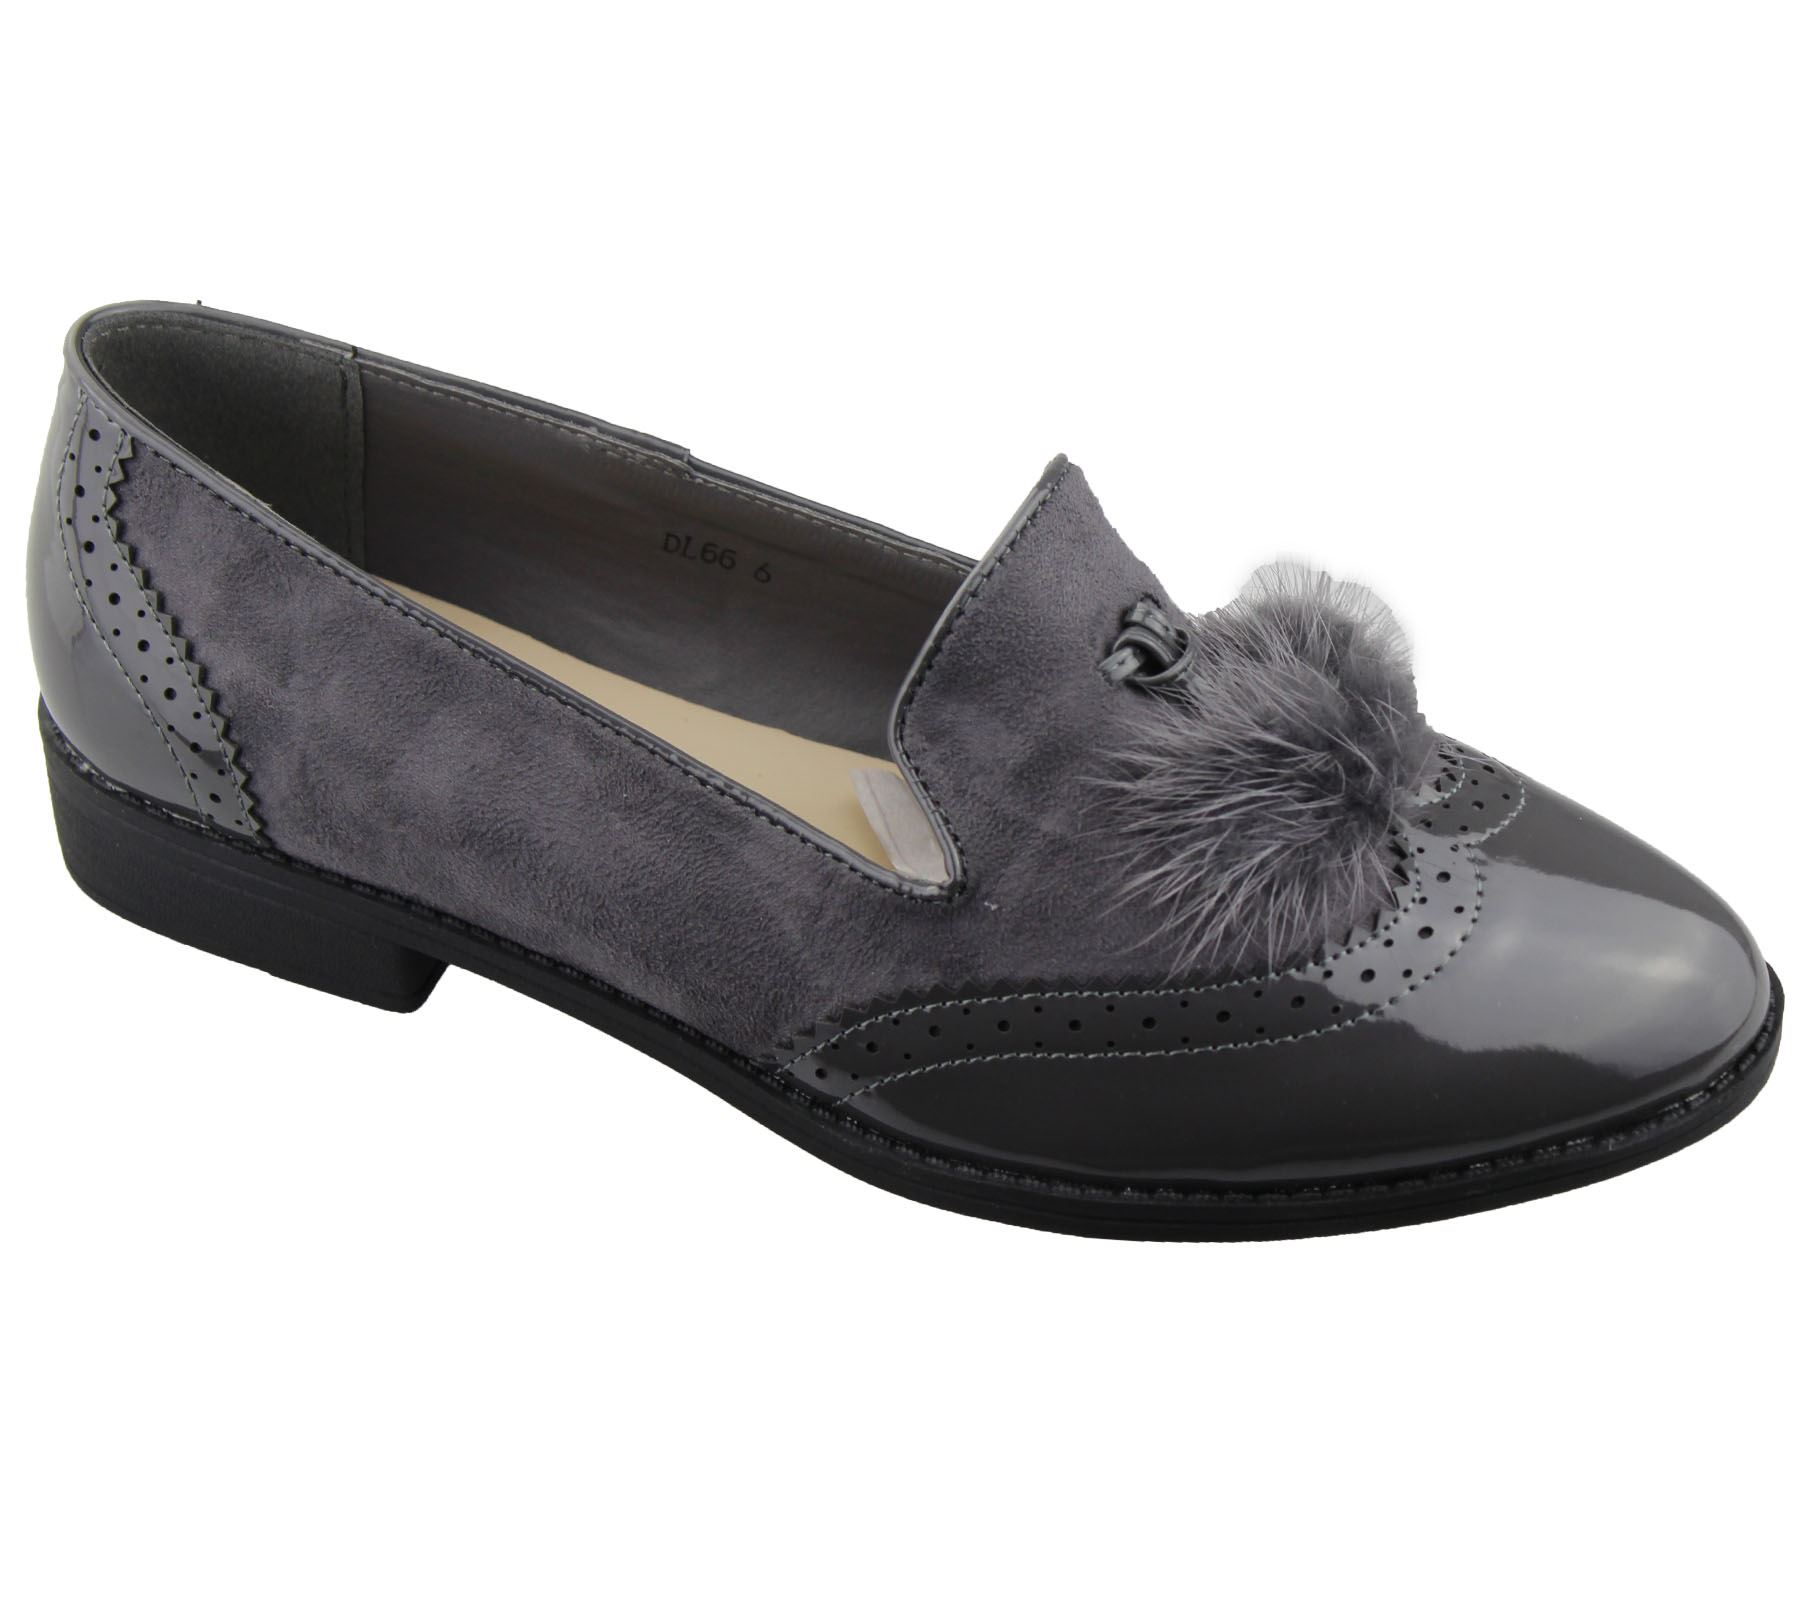 Mujer Sin Cordones TASEL CHAROL ANTE PLANO Oxford Zapatos Mocasines Zapatos Oxford 19d46f